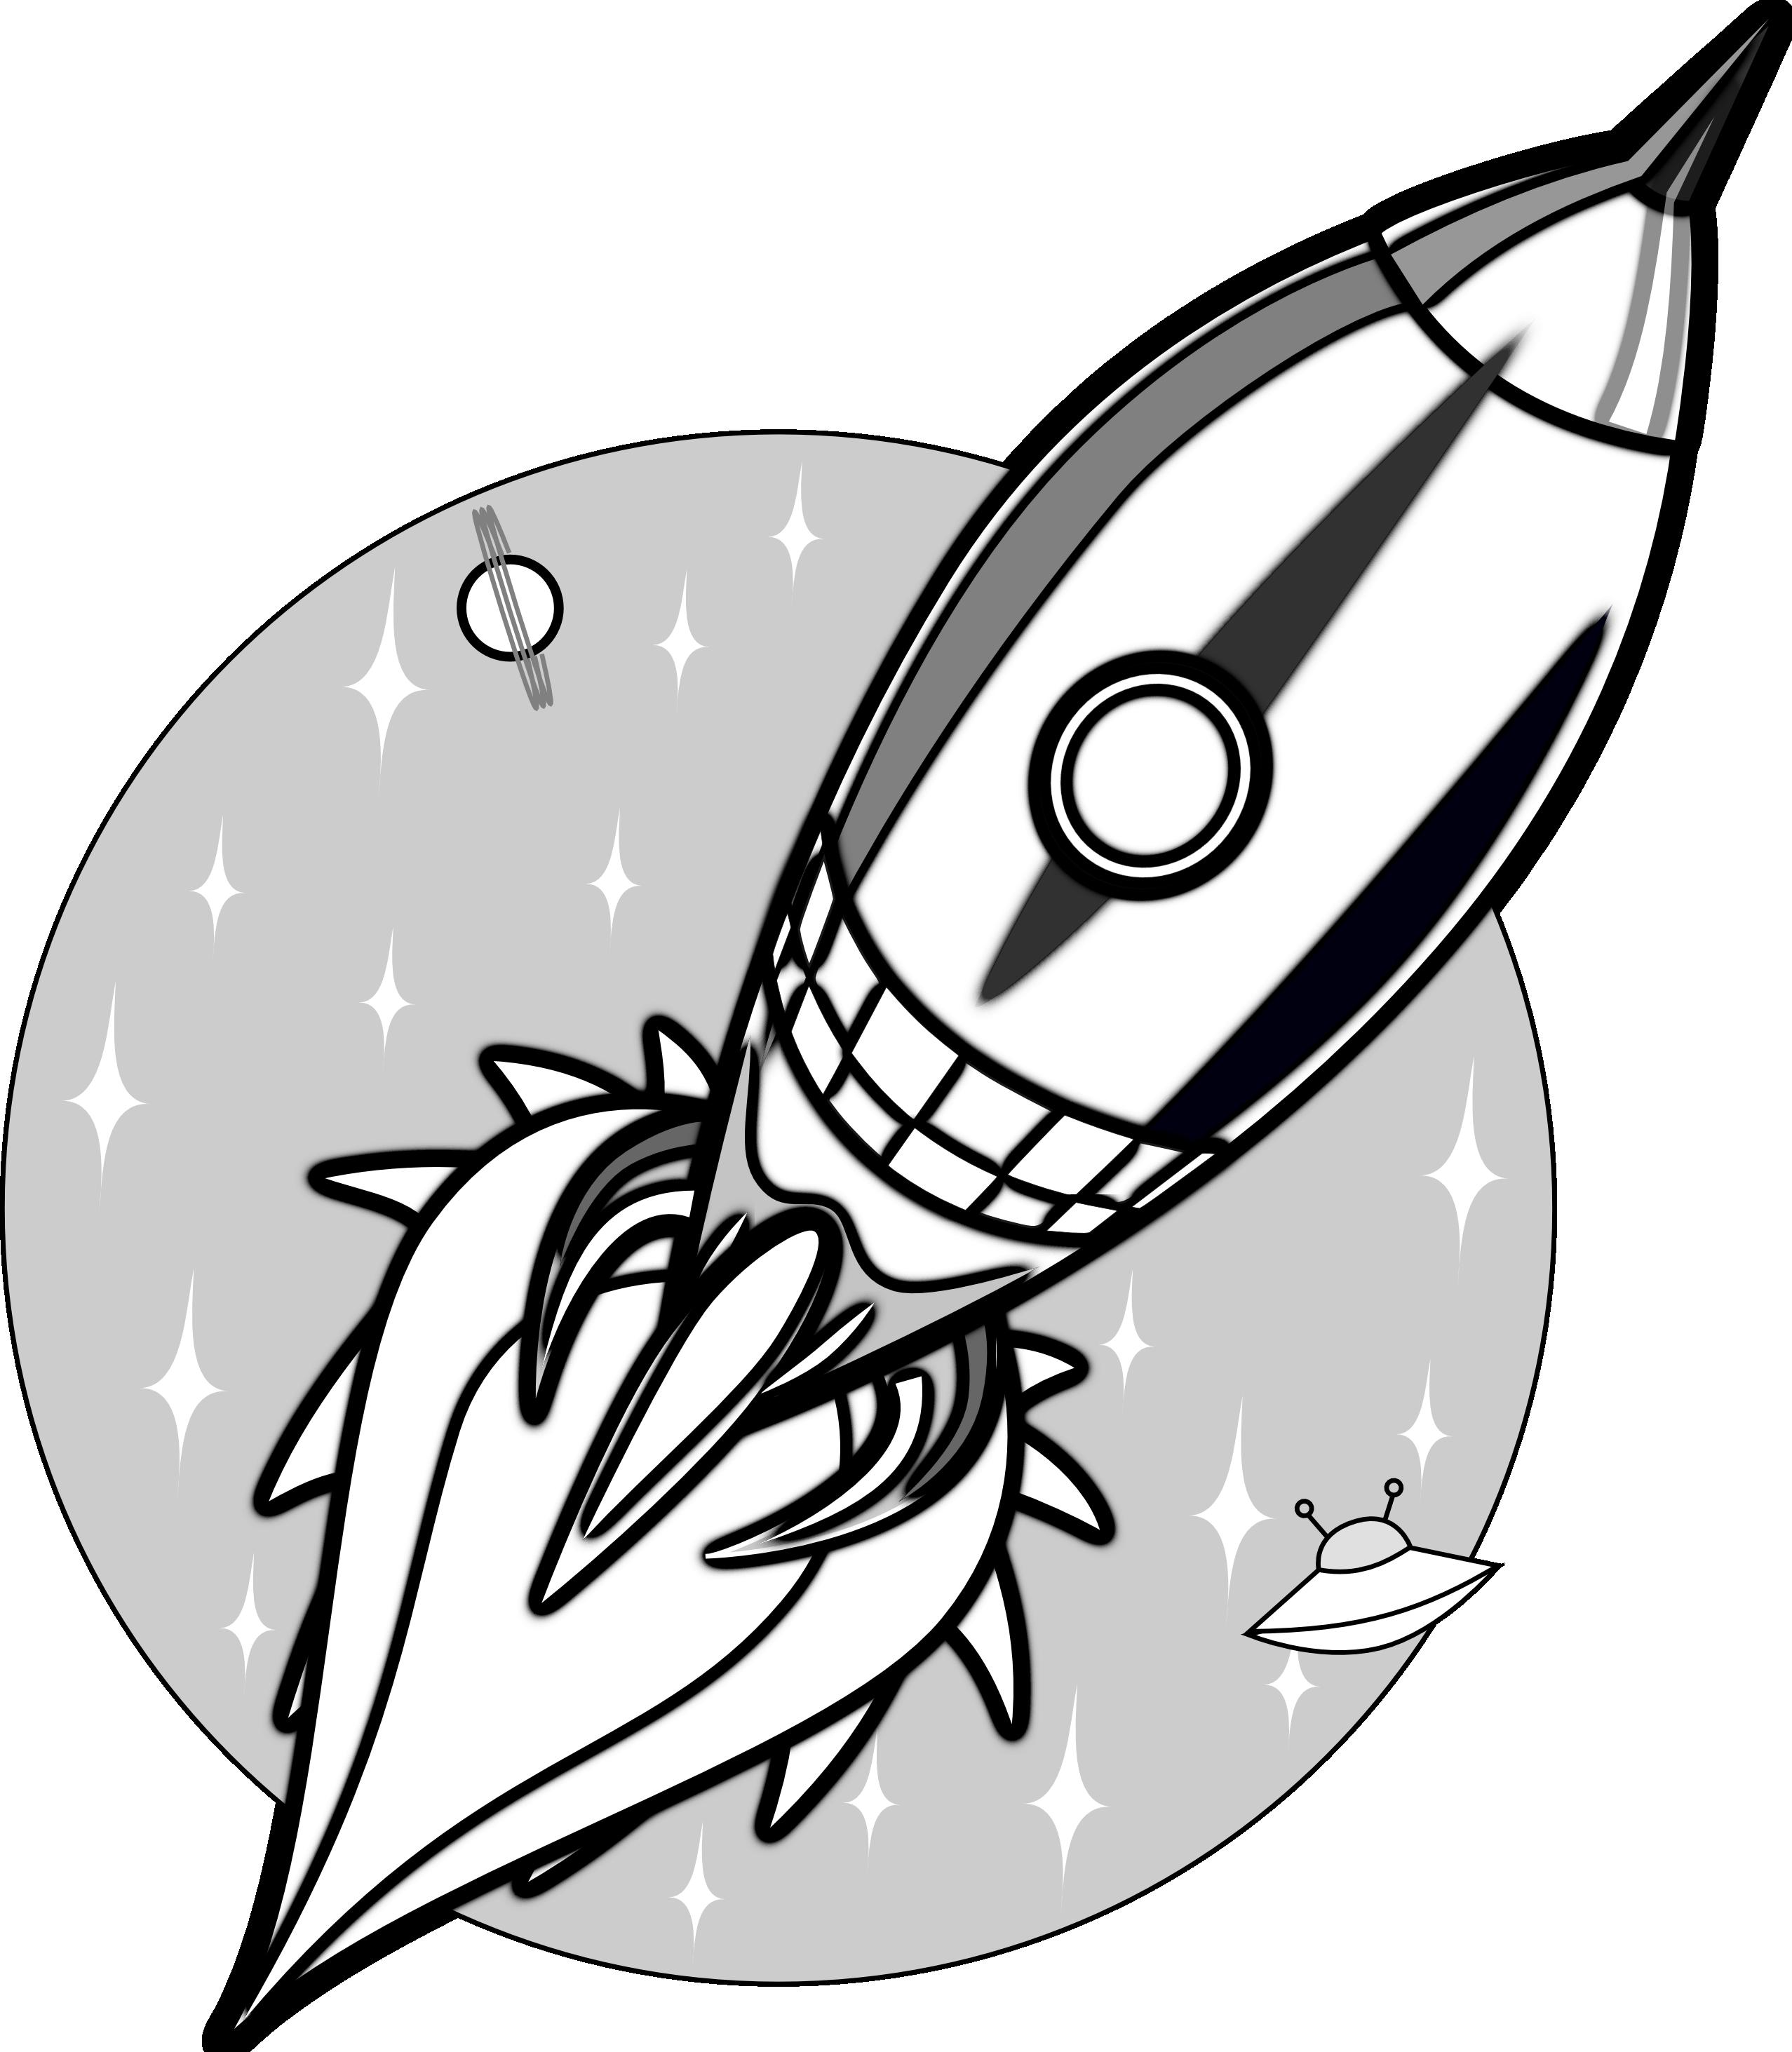 Line Drawing Rocket : Cartoon rocket clipart best